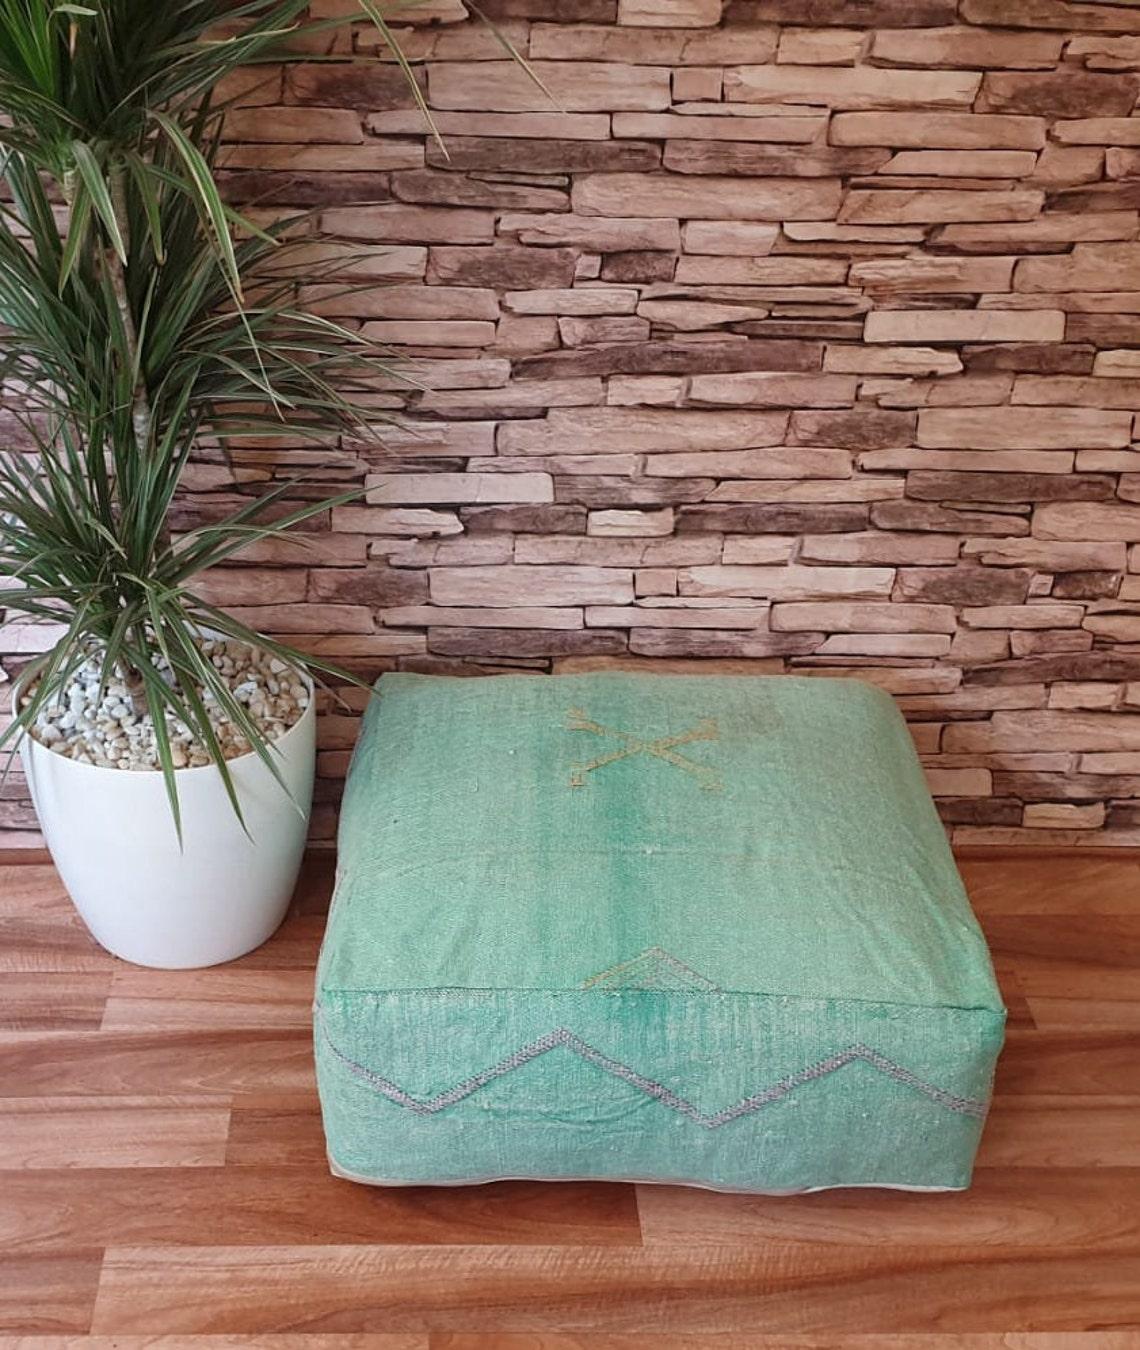 Handwoven Moroccan Sabra floor pouf, Cactus silk pouf,Handmade berber Pillow, Pillow cover,bed pillow, Floor Cushions,20